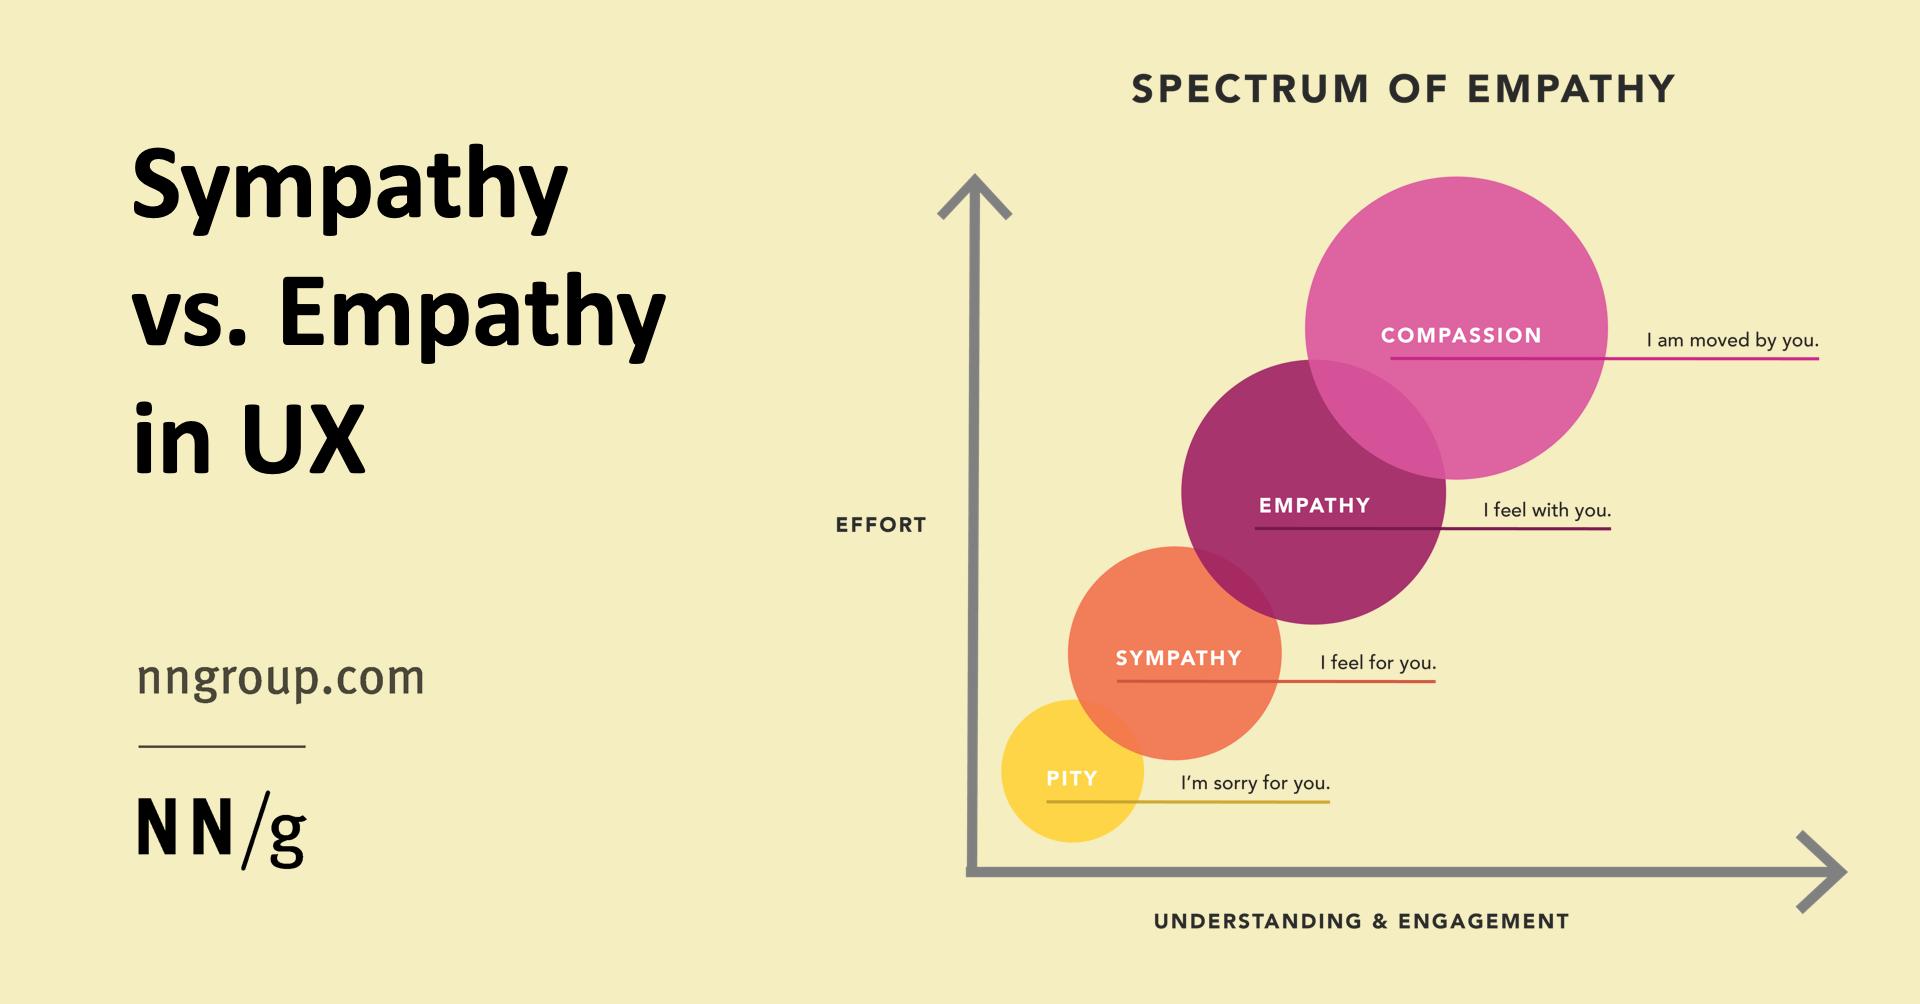 Sympathy vs. Empathy in UX